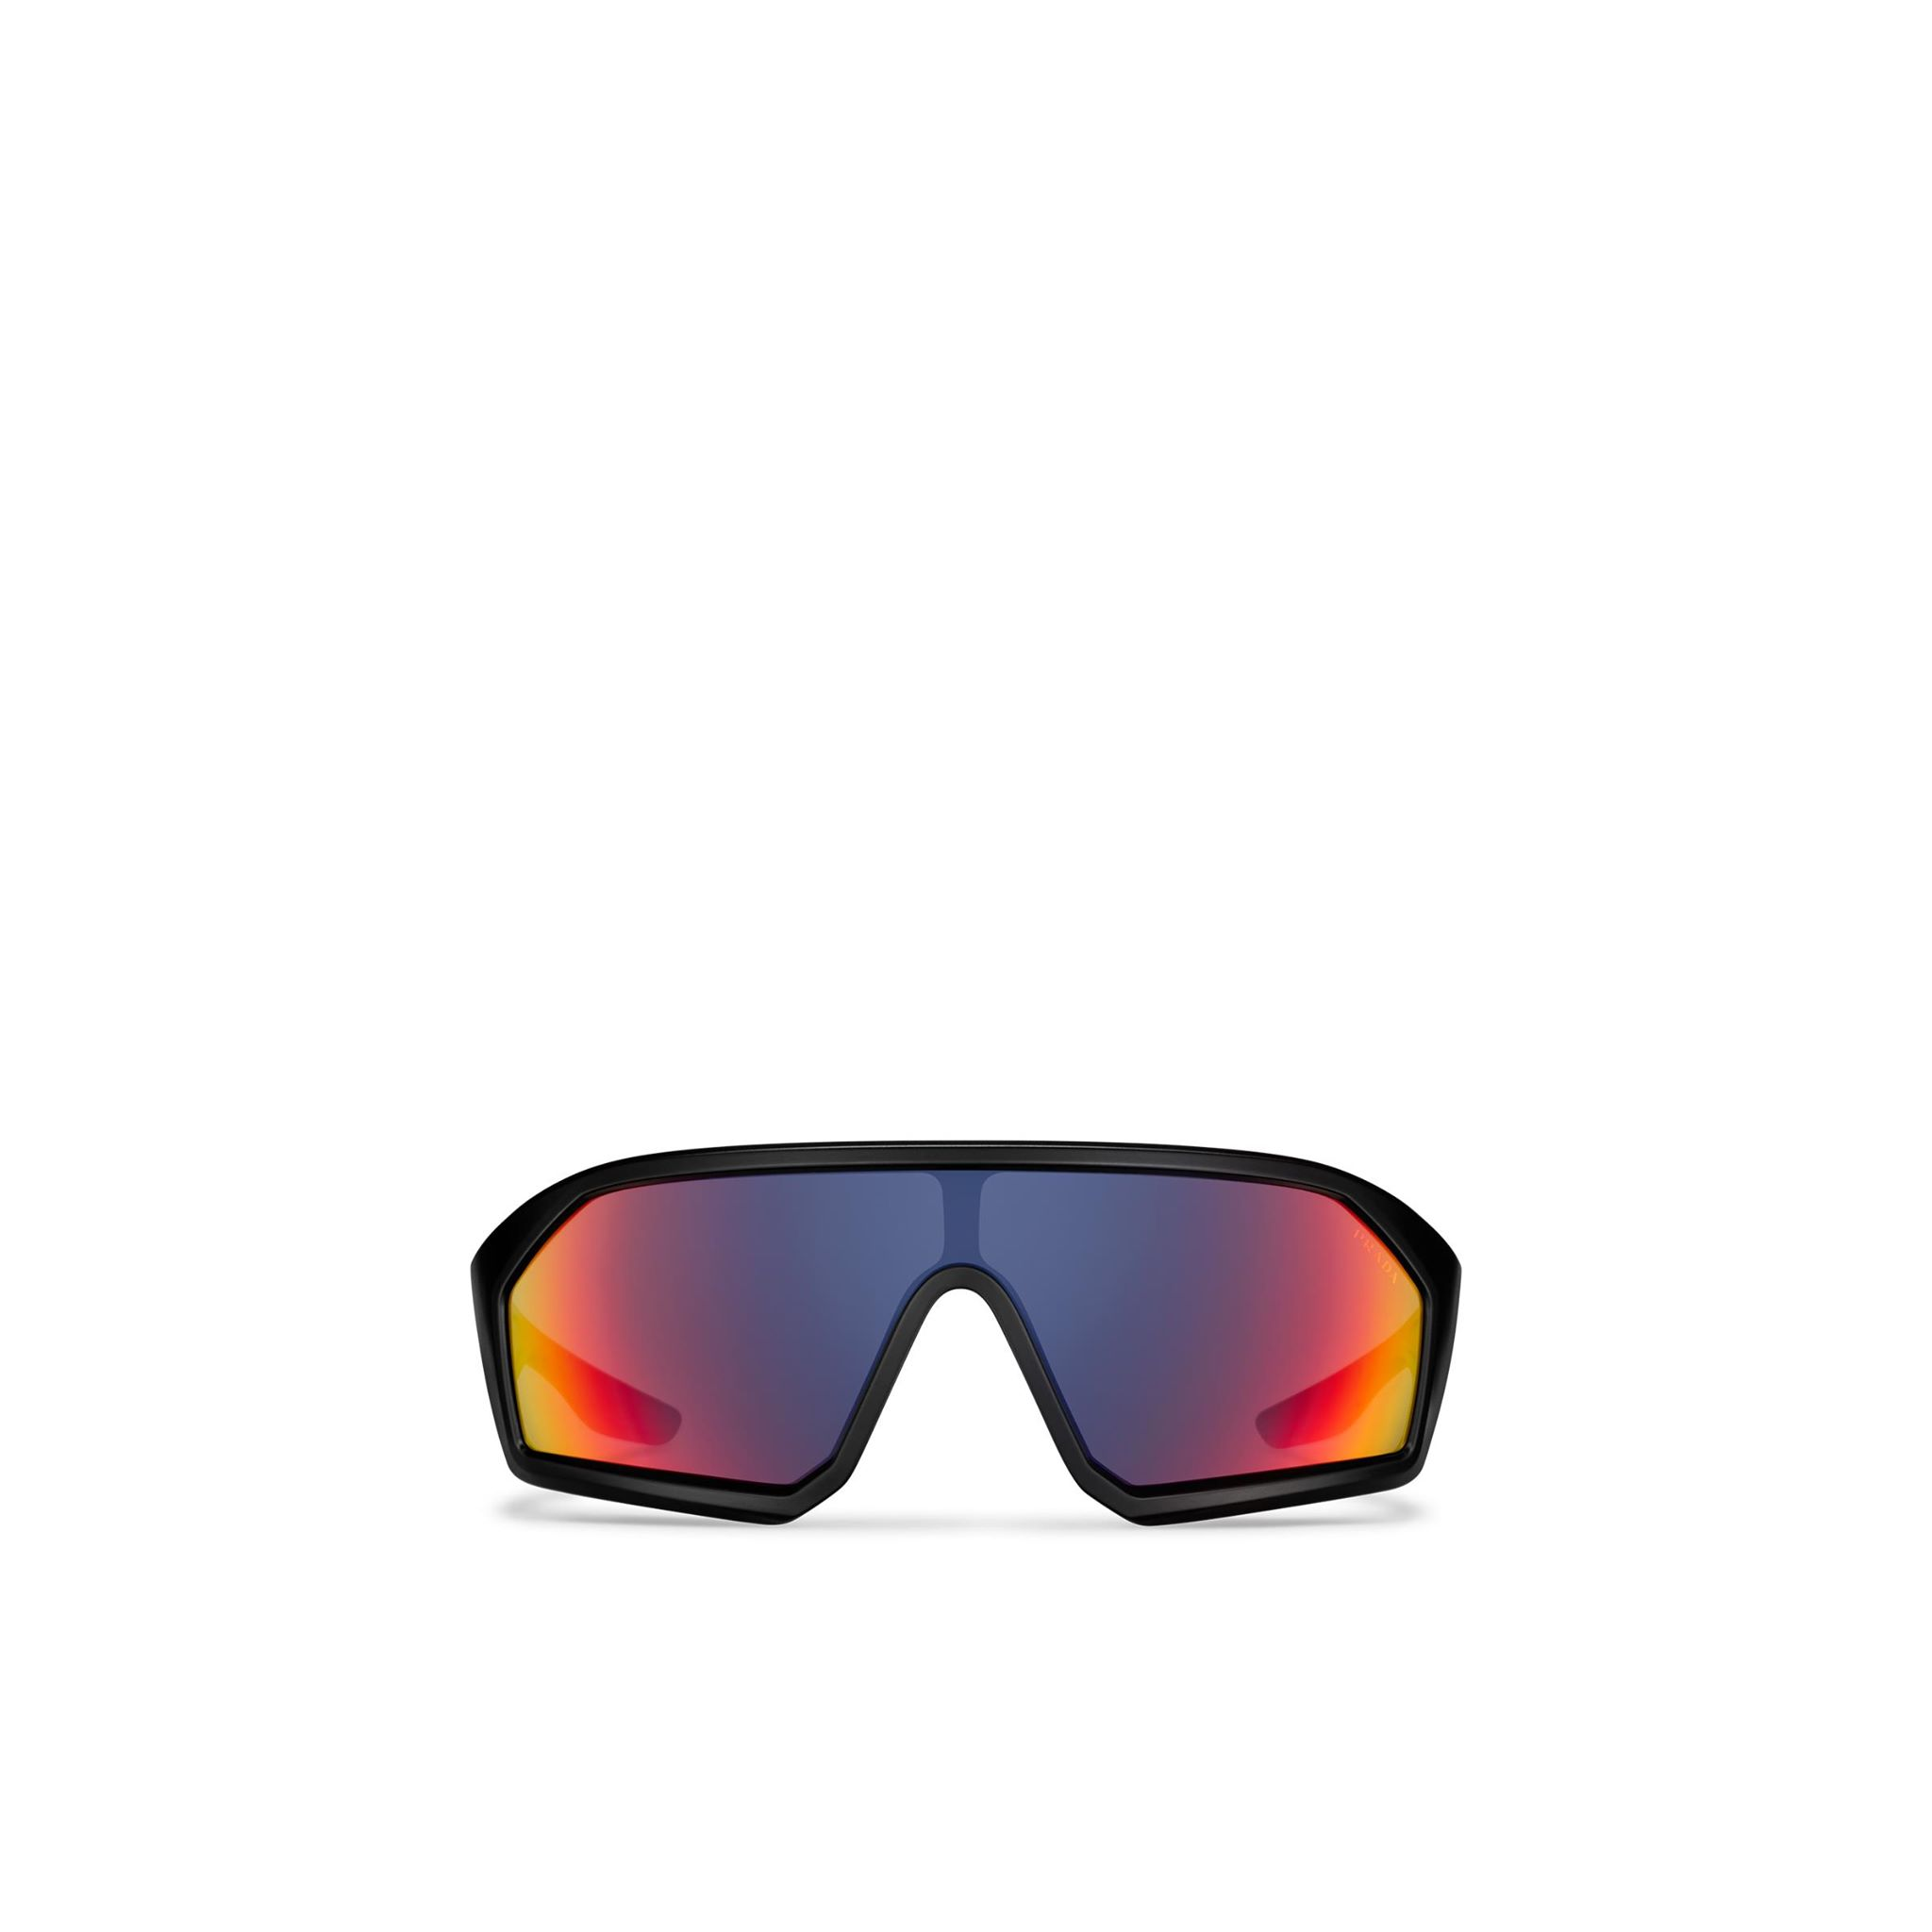 Prada Linea Rossa Impavid sunglasses